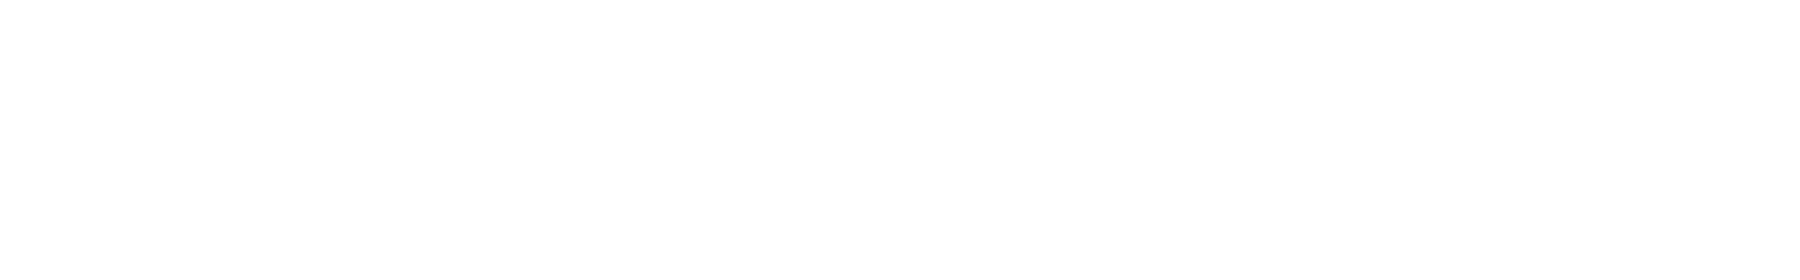 vocal fx   naming breakbeat genre 170 bpm